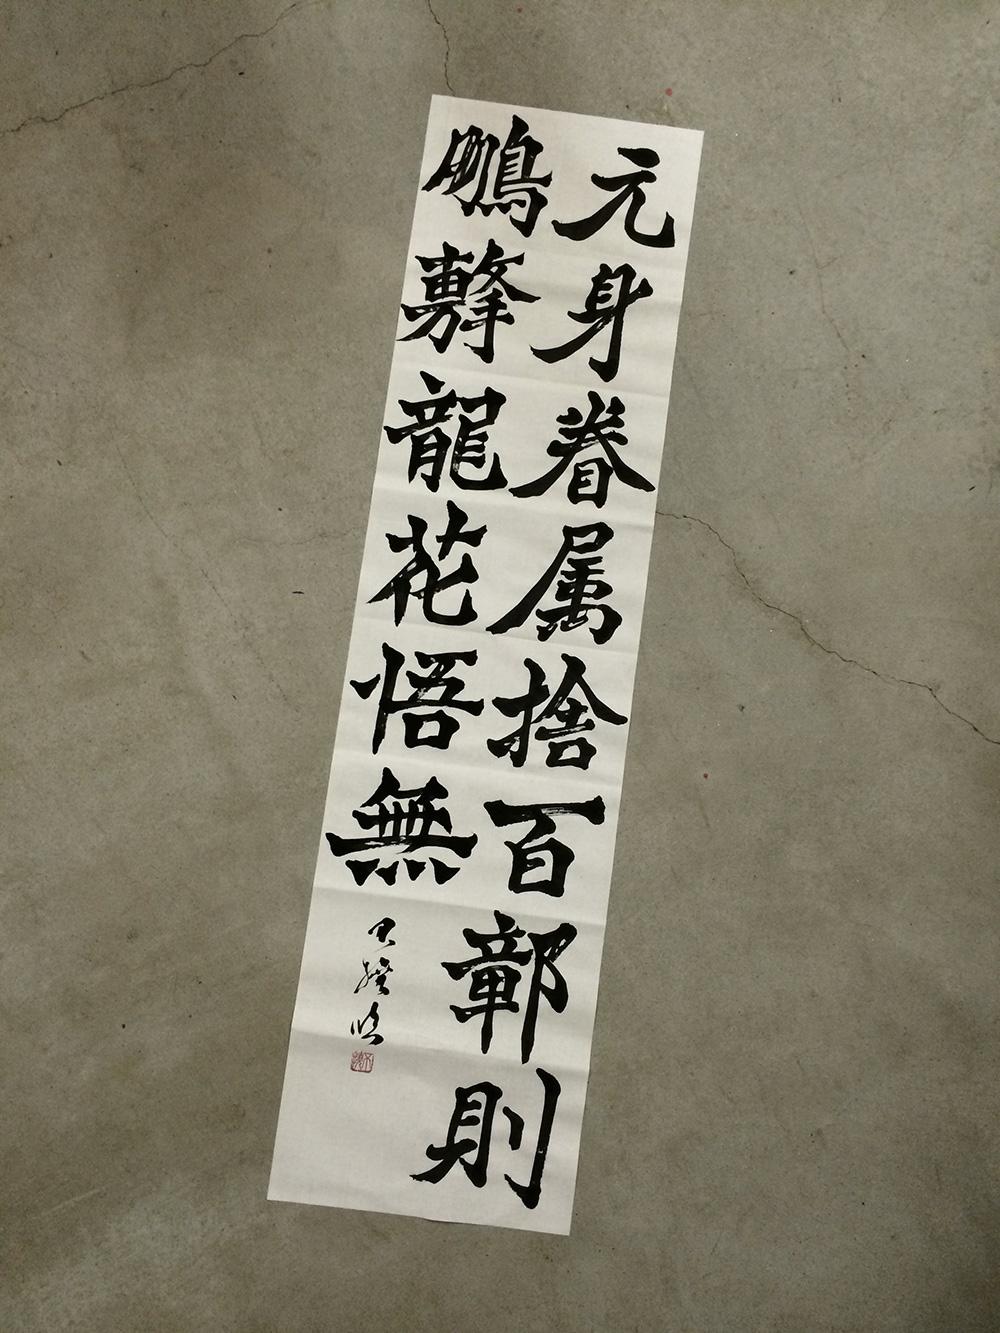 20140823_rin_gireizozoki_1.jpg